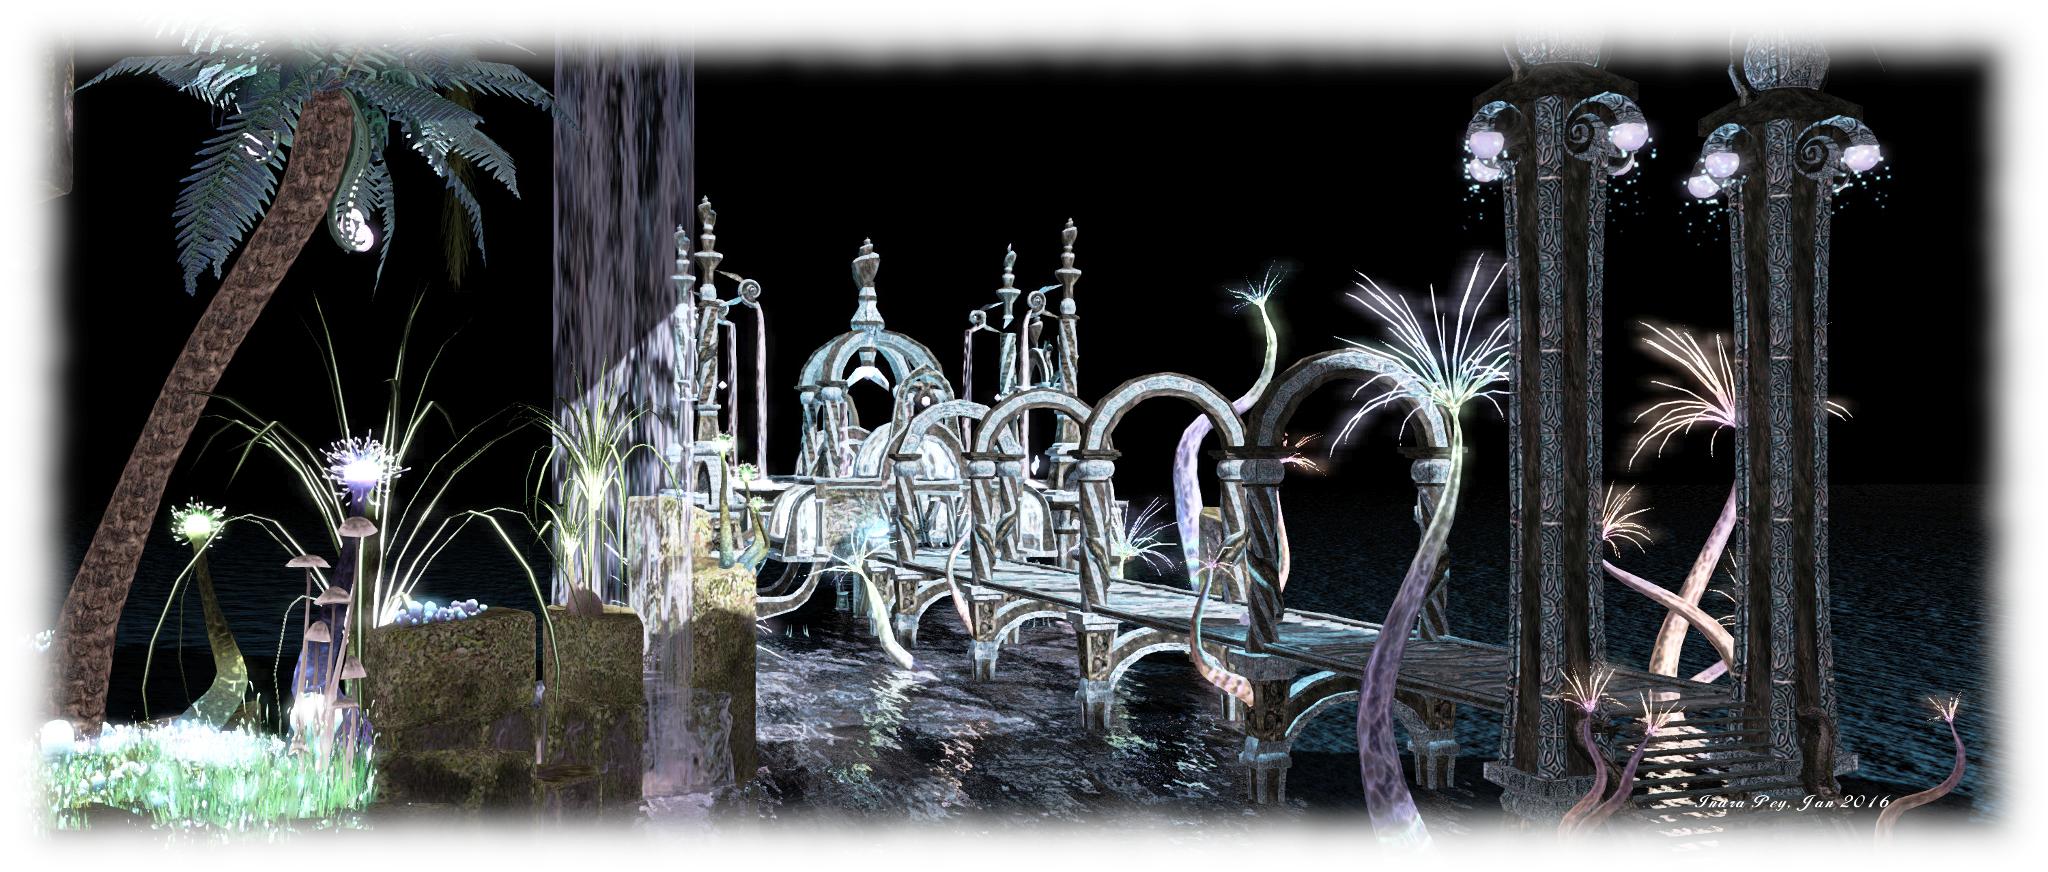 Cerridwen's Cauldron; Inara Pey, January 2016, on Flickr